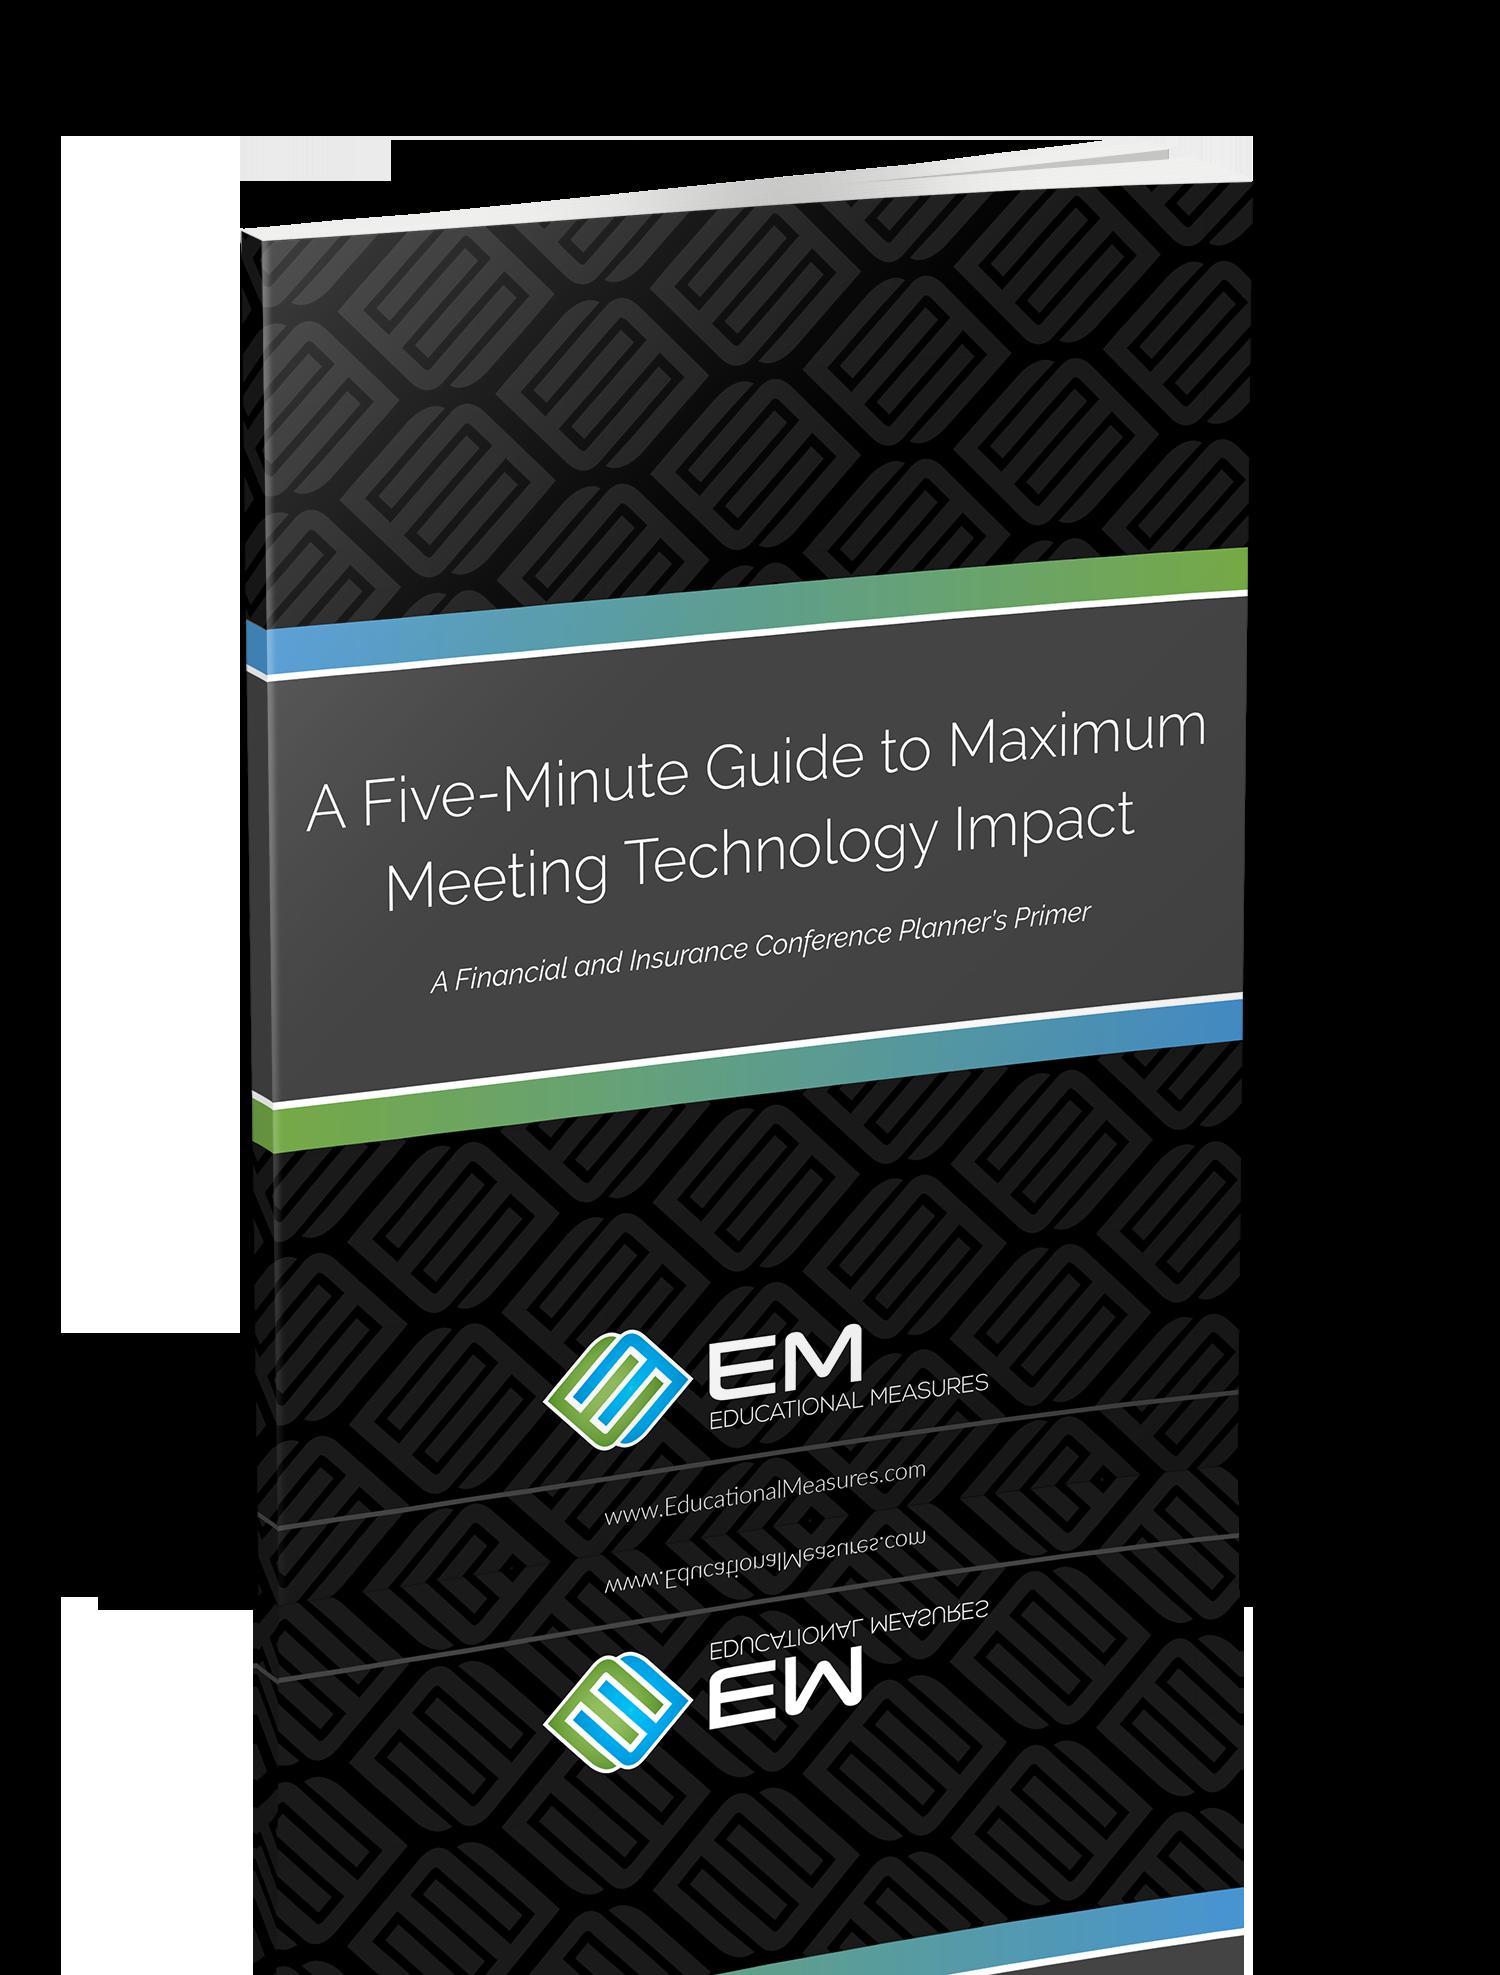 em-5-min-guide-max-meeting-tech-impact-FICP.png